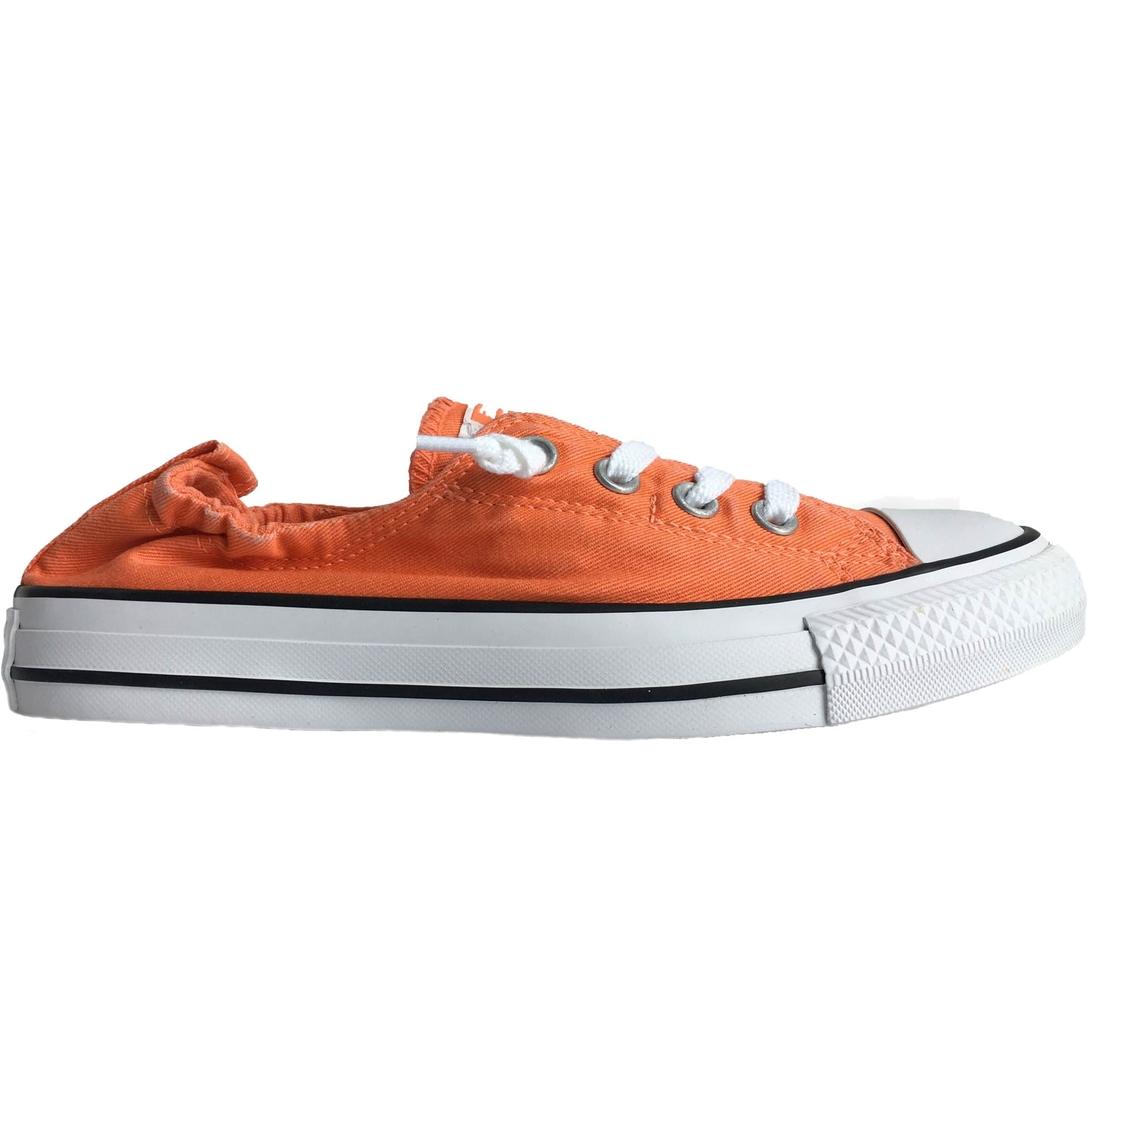 Star Shoreline Shoes   Sneakers   Shoes